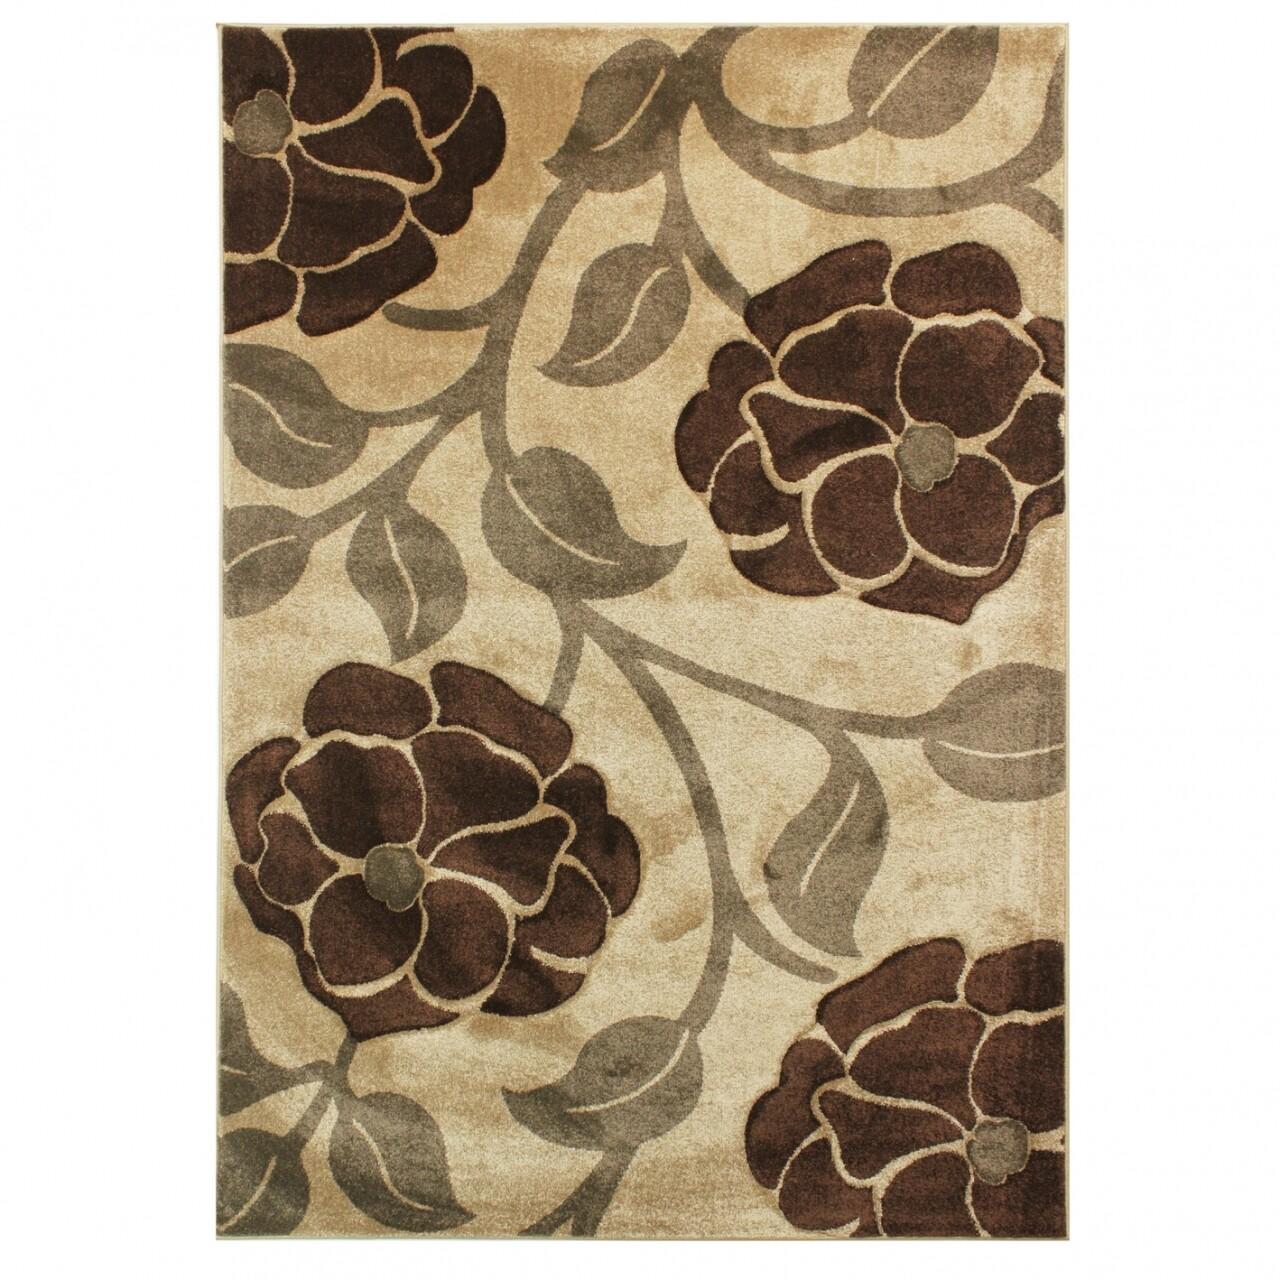 Covor Vine, Flair Rugs, 80 x 150 cm, 100% polipropilena, bej/maro